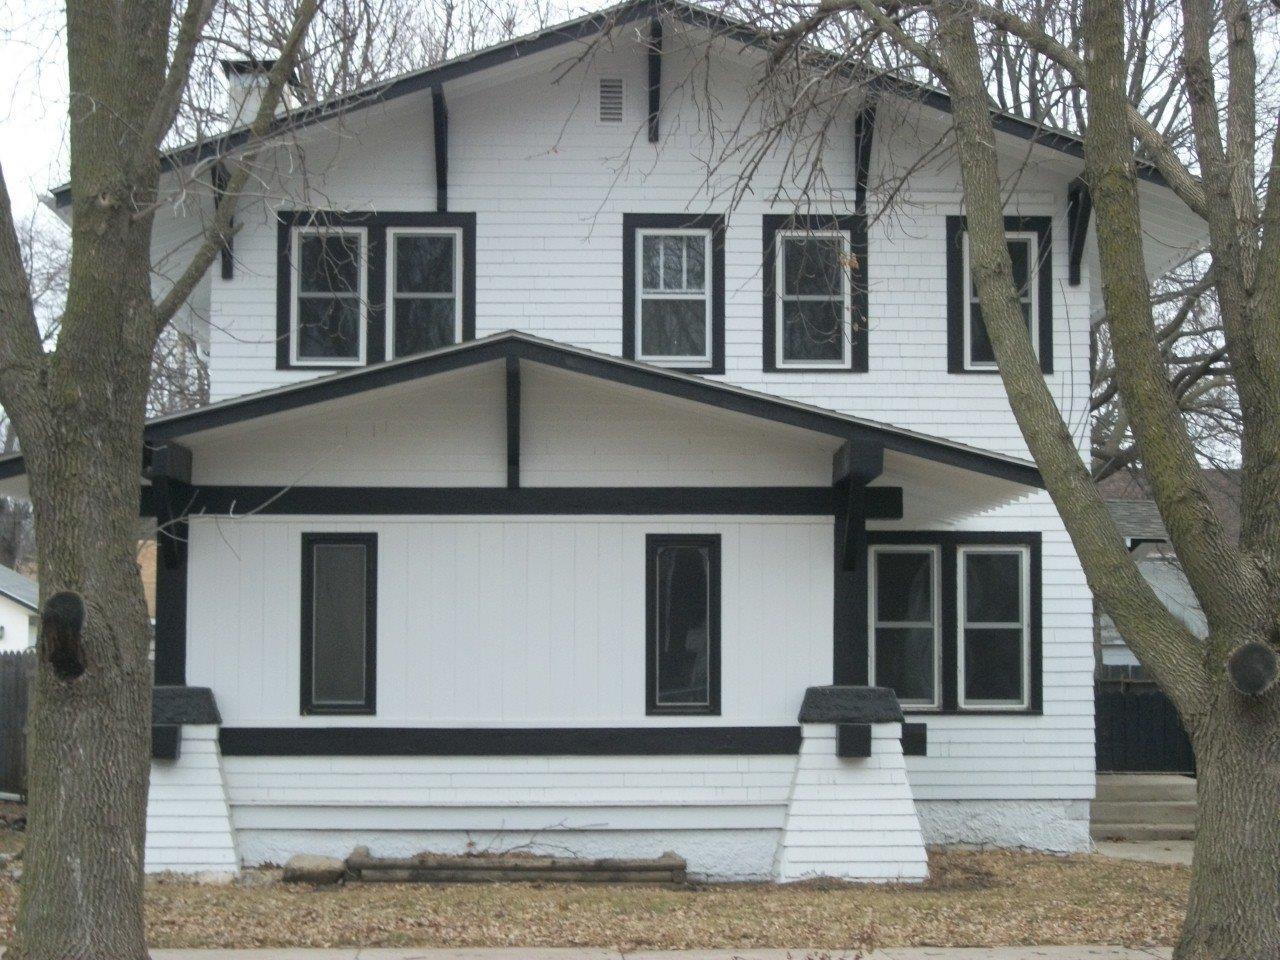 444 Euclid Ave, Cherokee, IA 51012